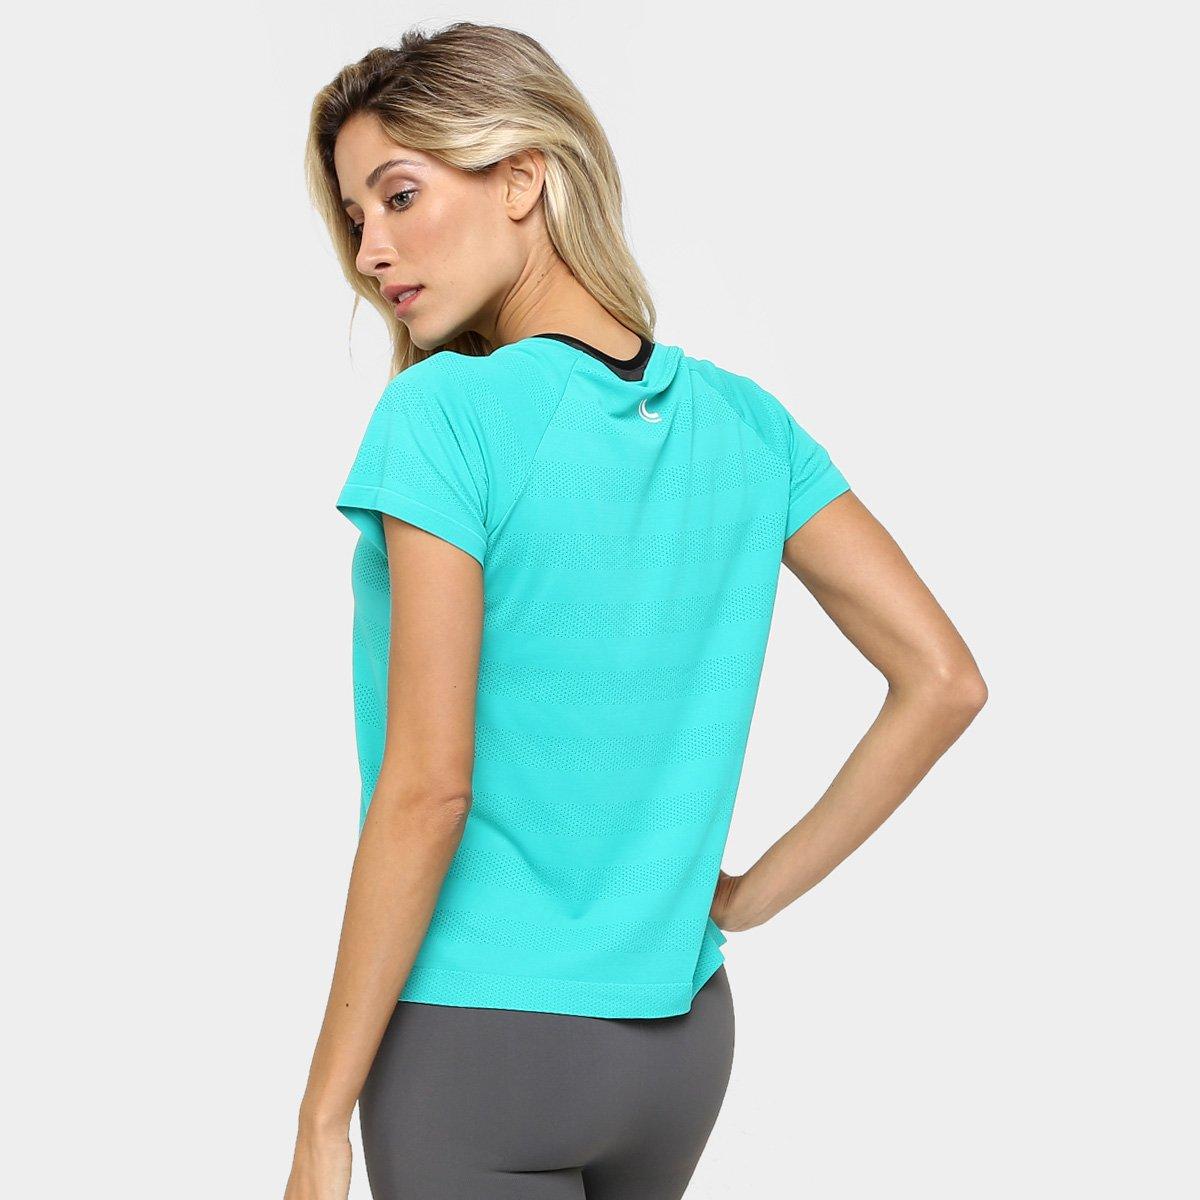 Feminina Lupo Camiseta Lupo Cropped Verde Sport água Camiseta X78qzqw